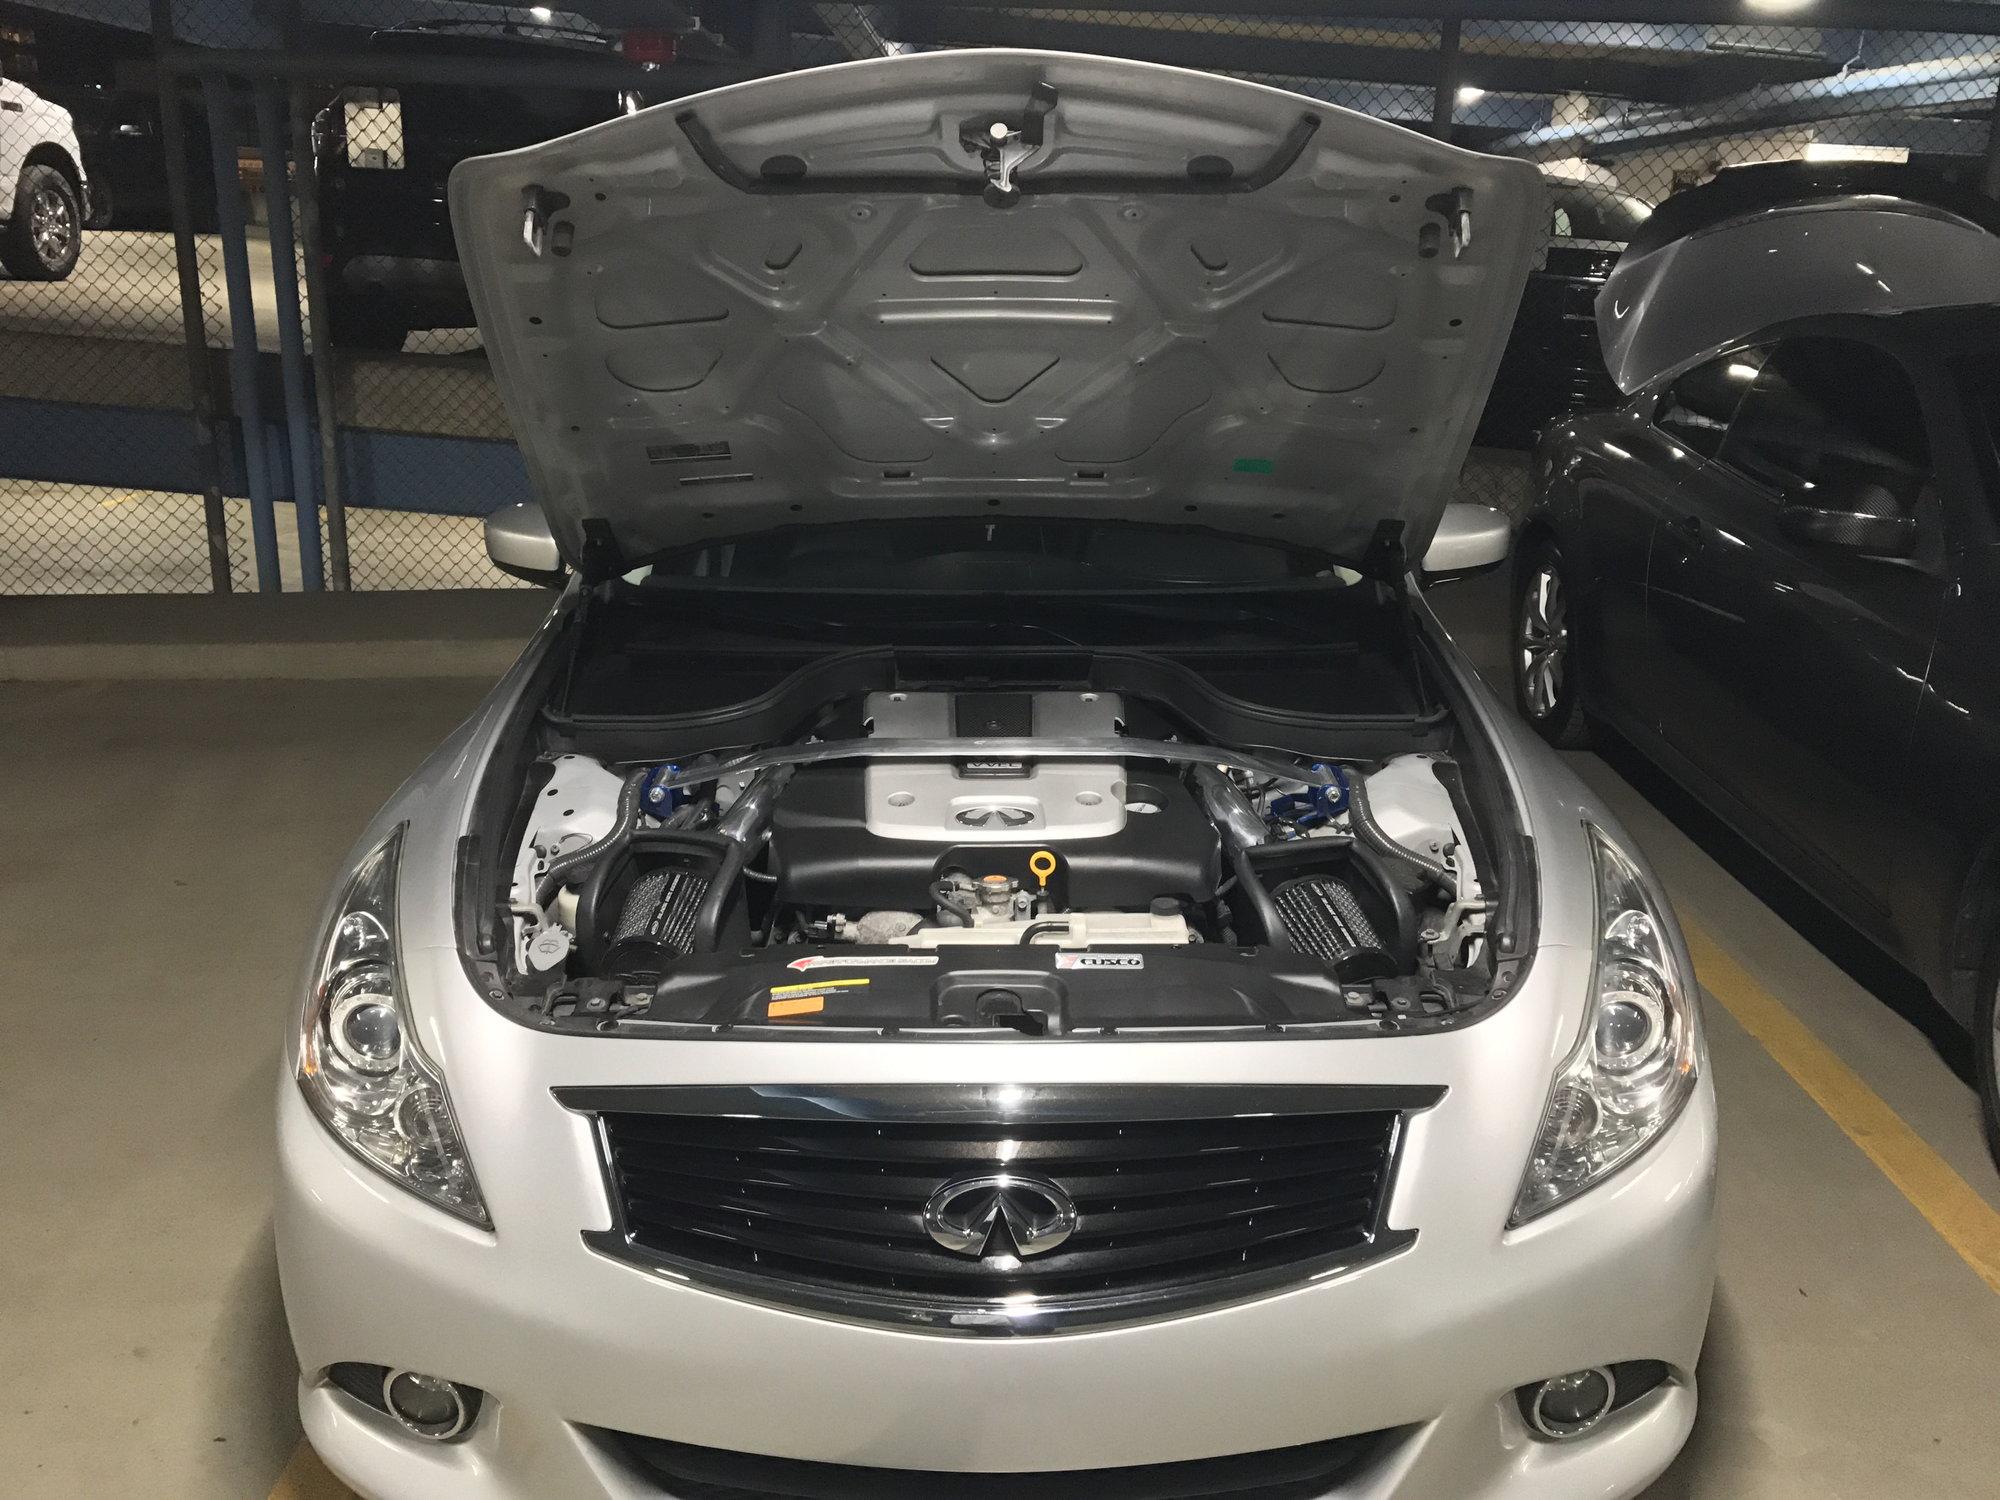 2012 Infiniti G37x Sedan Build Myg37